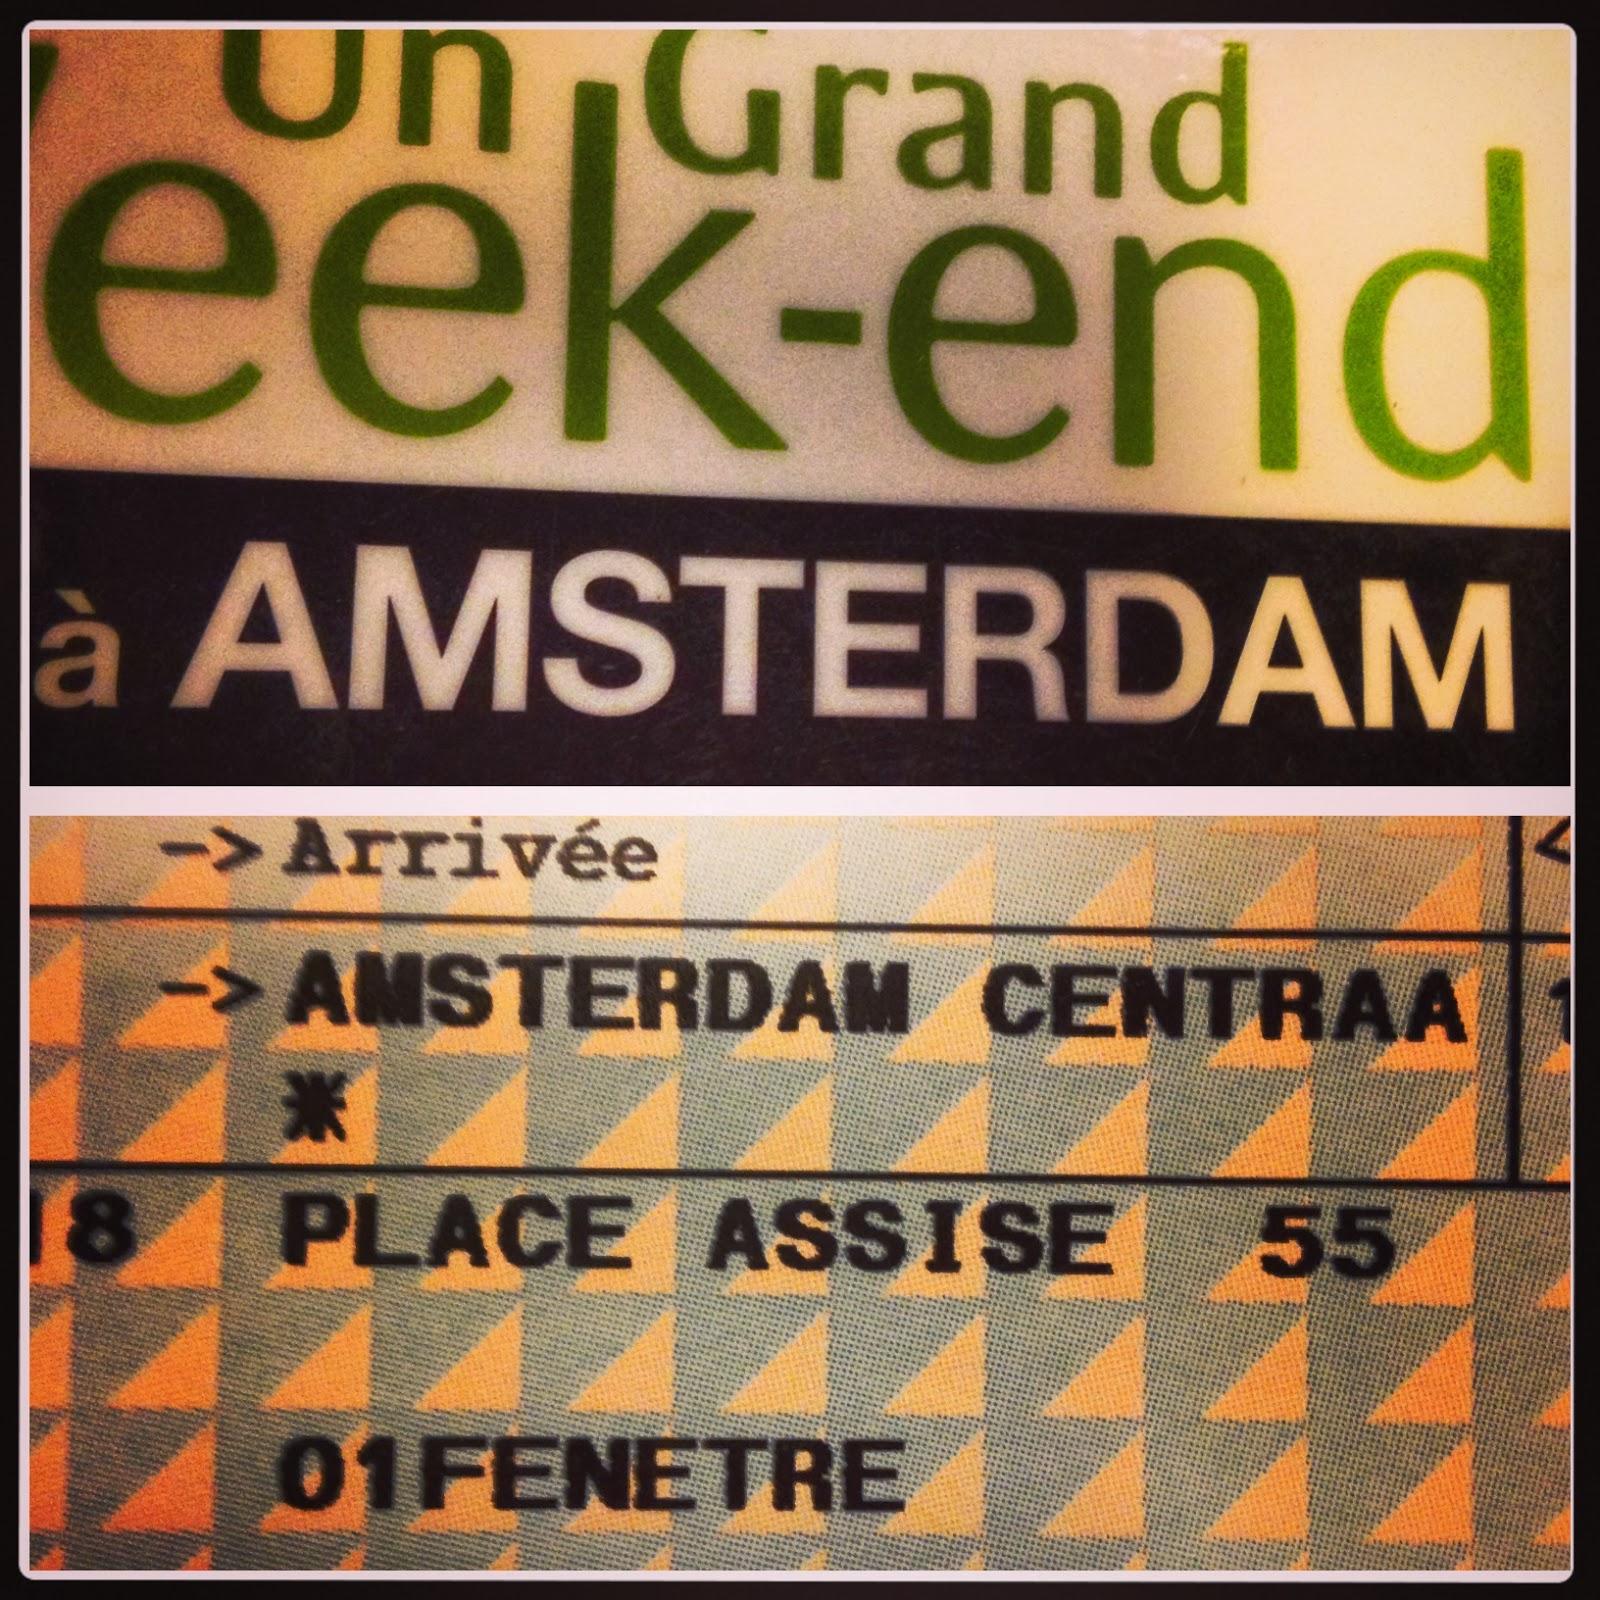 4 jours à Amsterdam - 4 days in Amsterdam - 4 dagen in Amsterdam